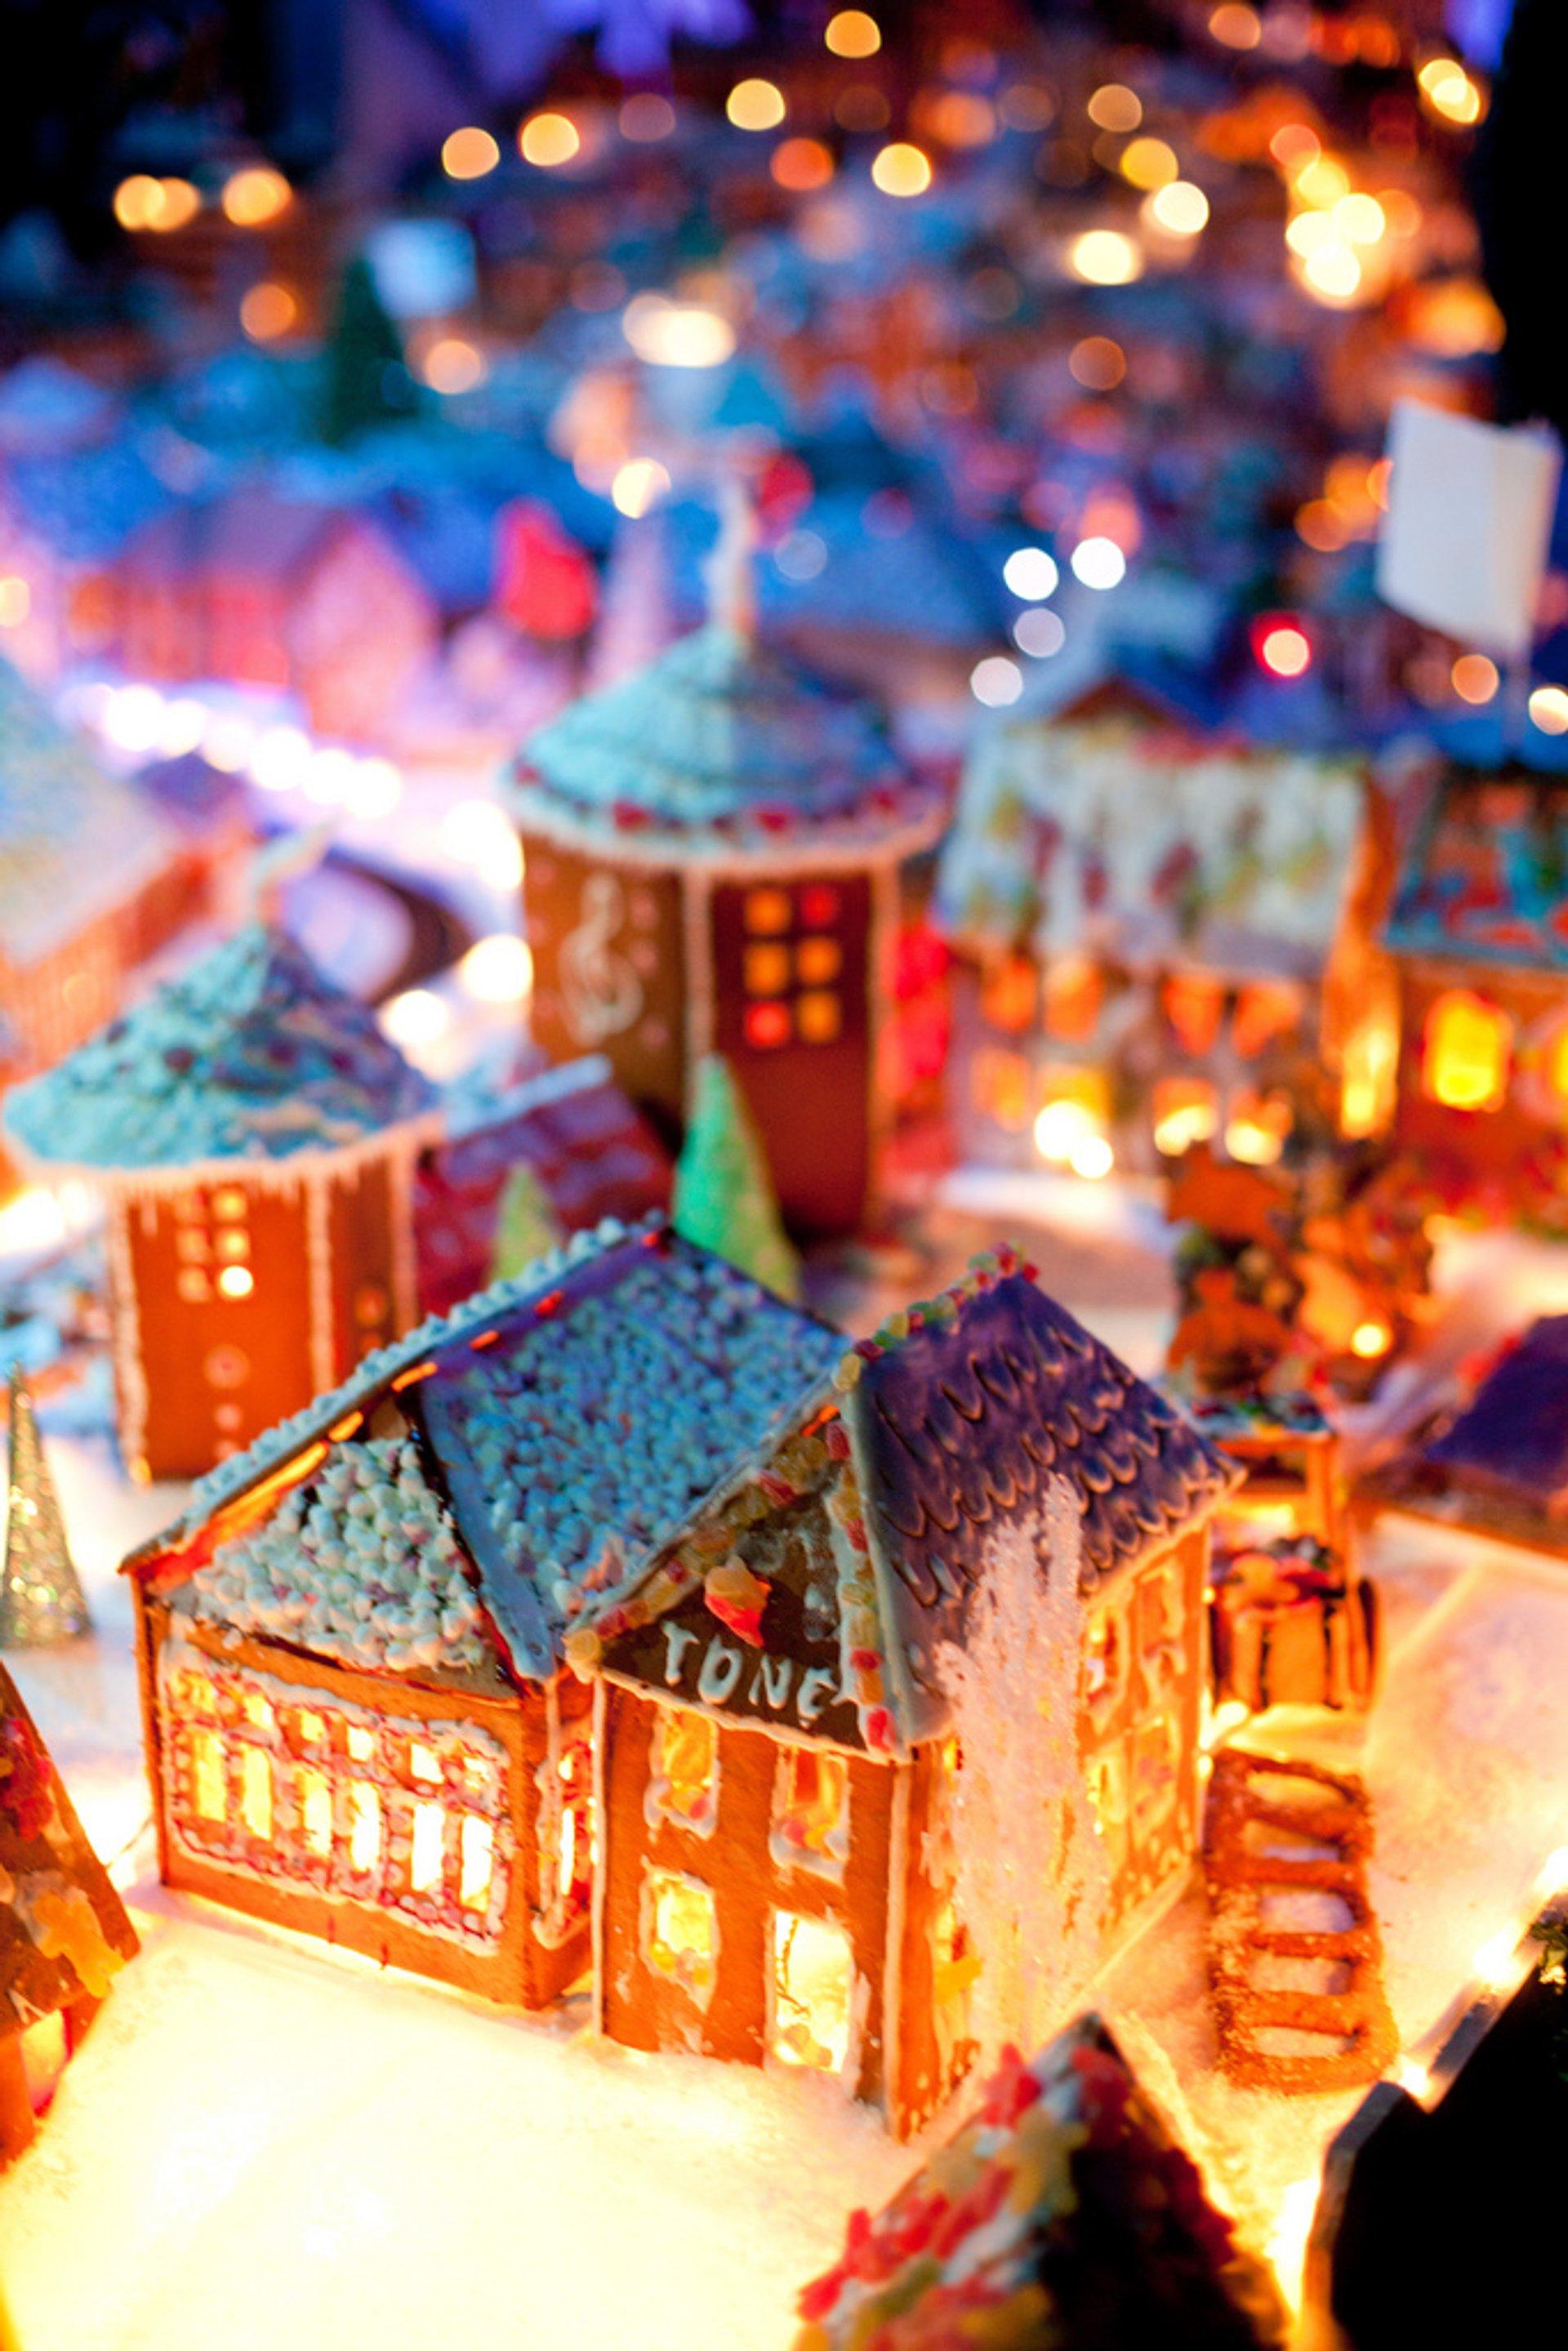 Bergen's Gingerbread Town (Pepperkakebyen) in Norway - Best Season 2020